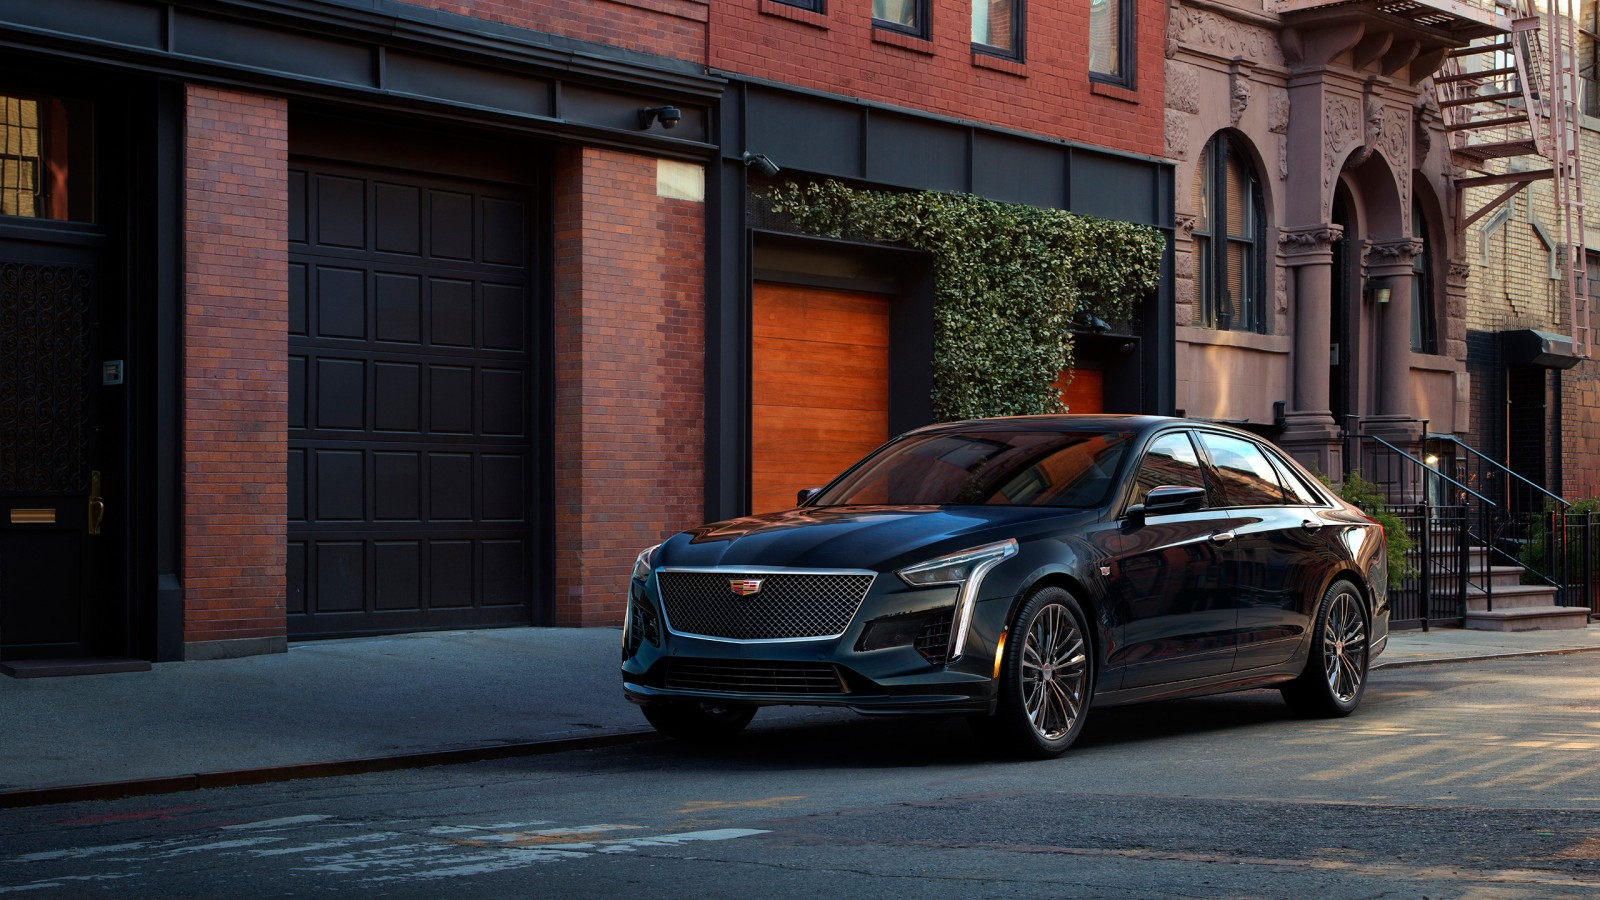 2019 Cadillac CT6 V Sport 2 Wallpaper | HD Car Wallpapers| ID #10010